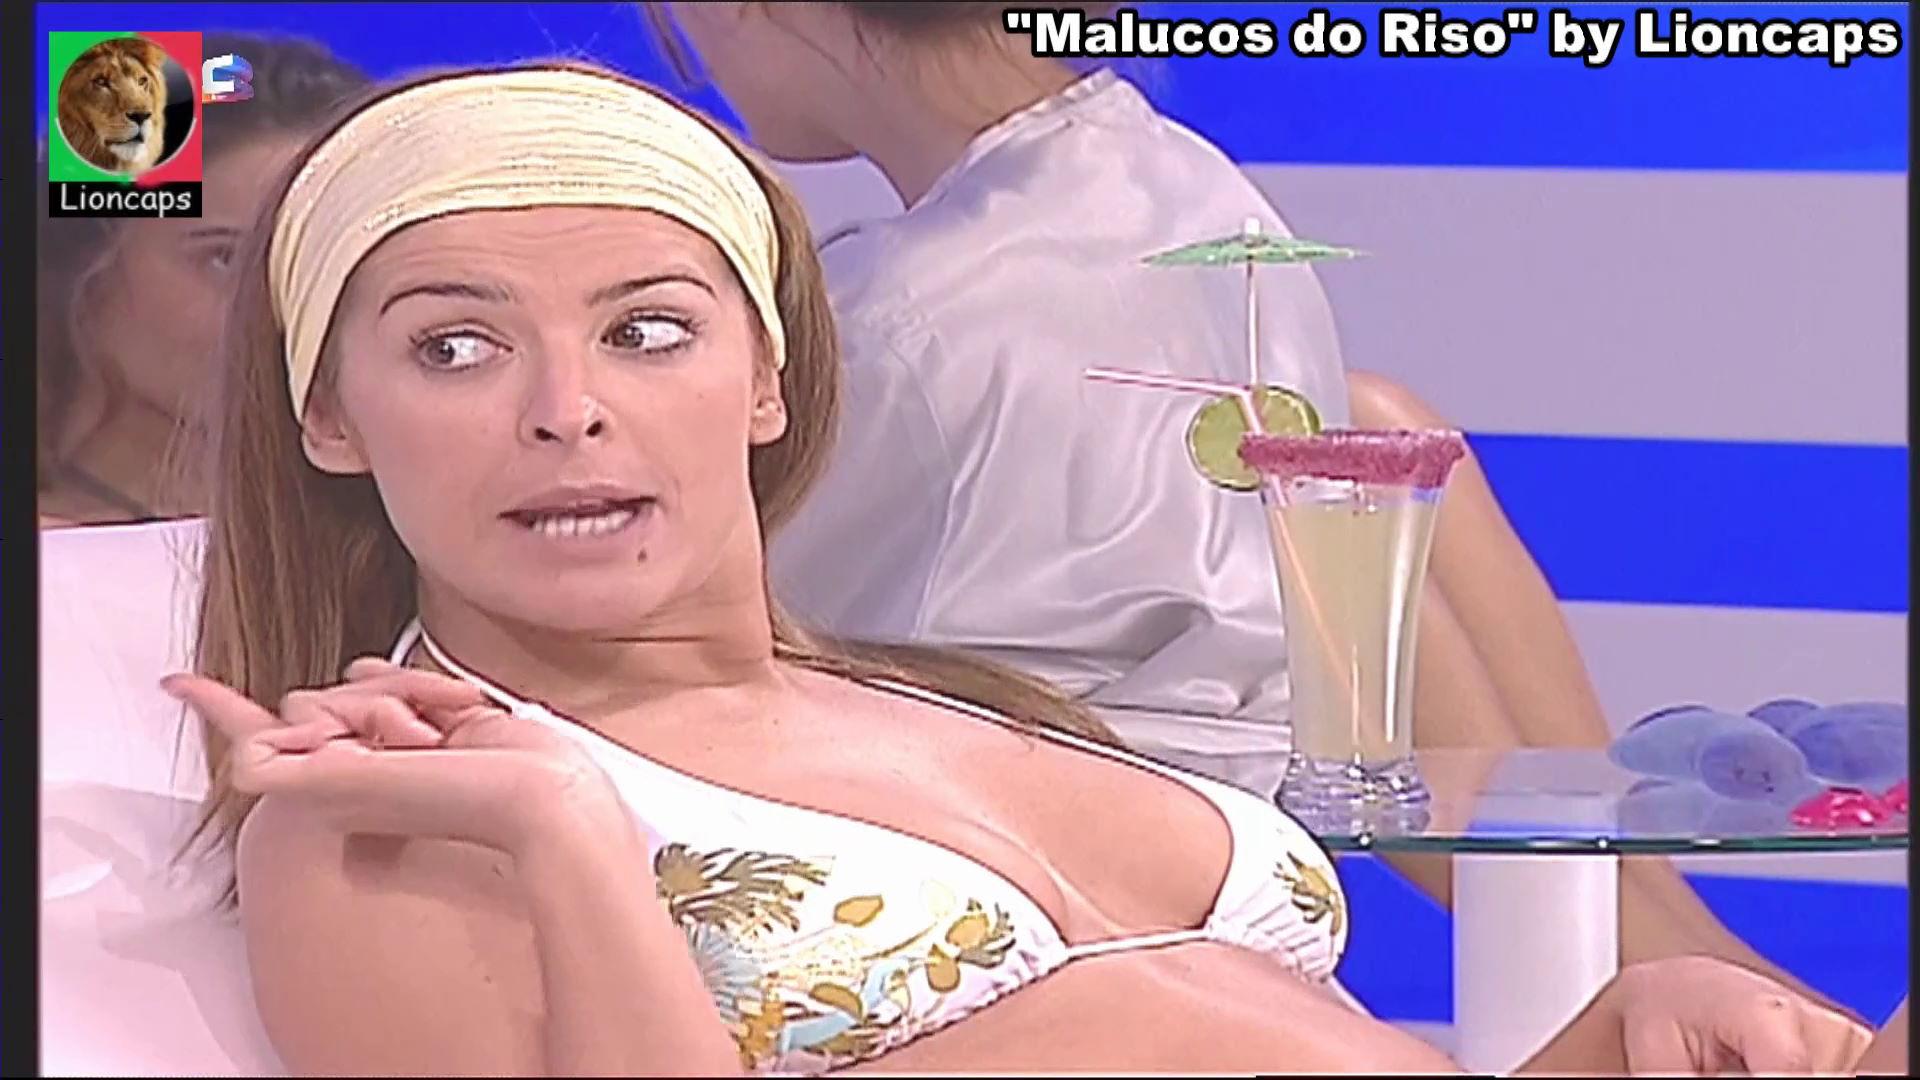 475206583_malucos_riso_alda_gomes_vs190malucos_riso_602_15098_122_343lo.JPG